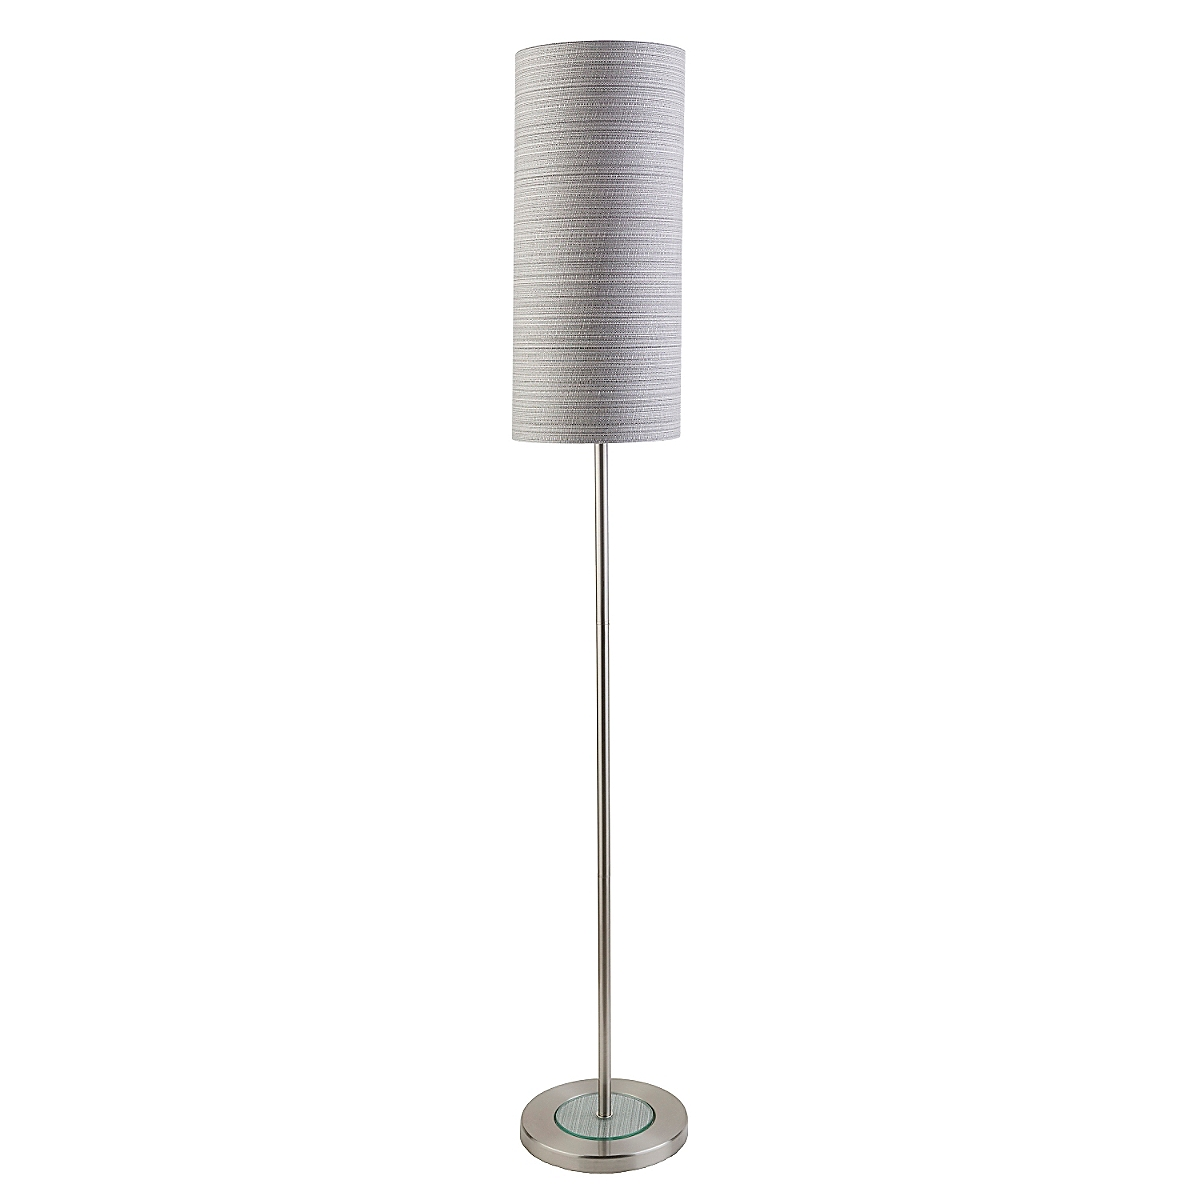 Amaya Floor Lamp - Gray